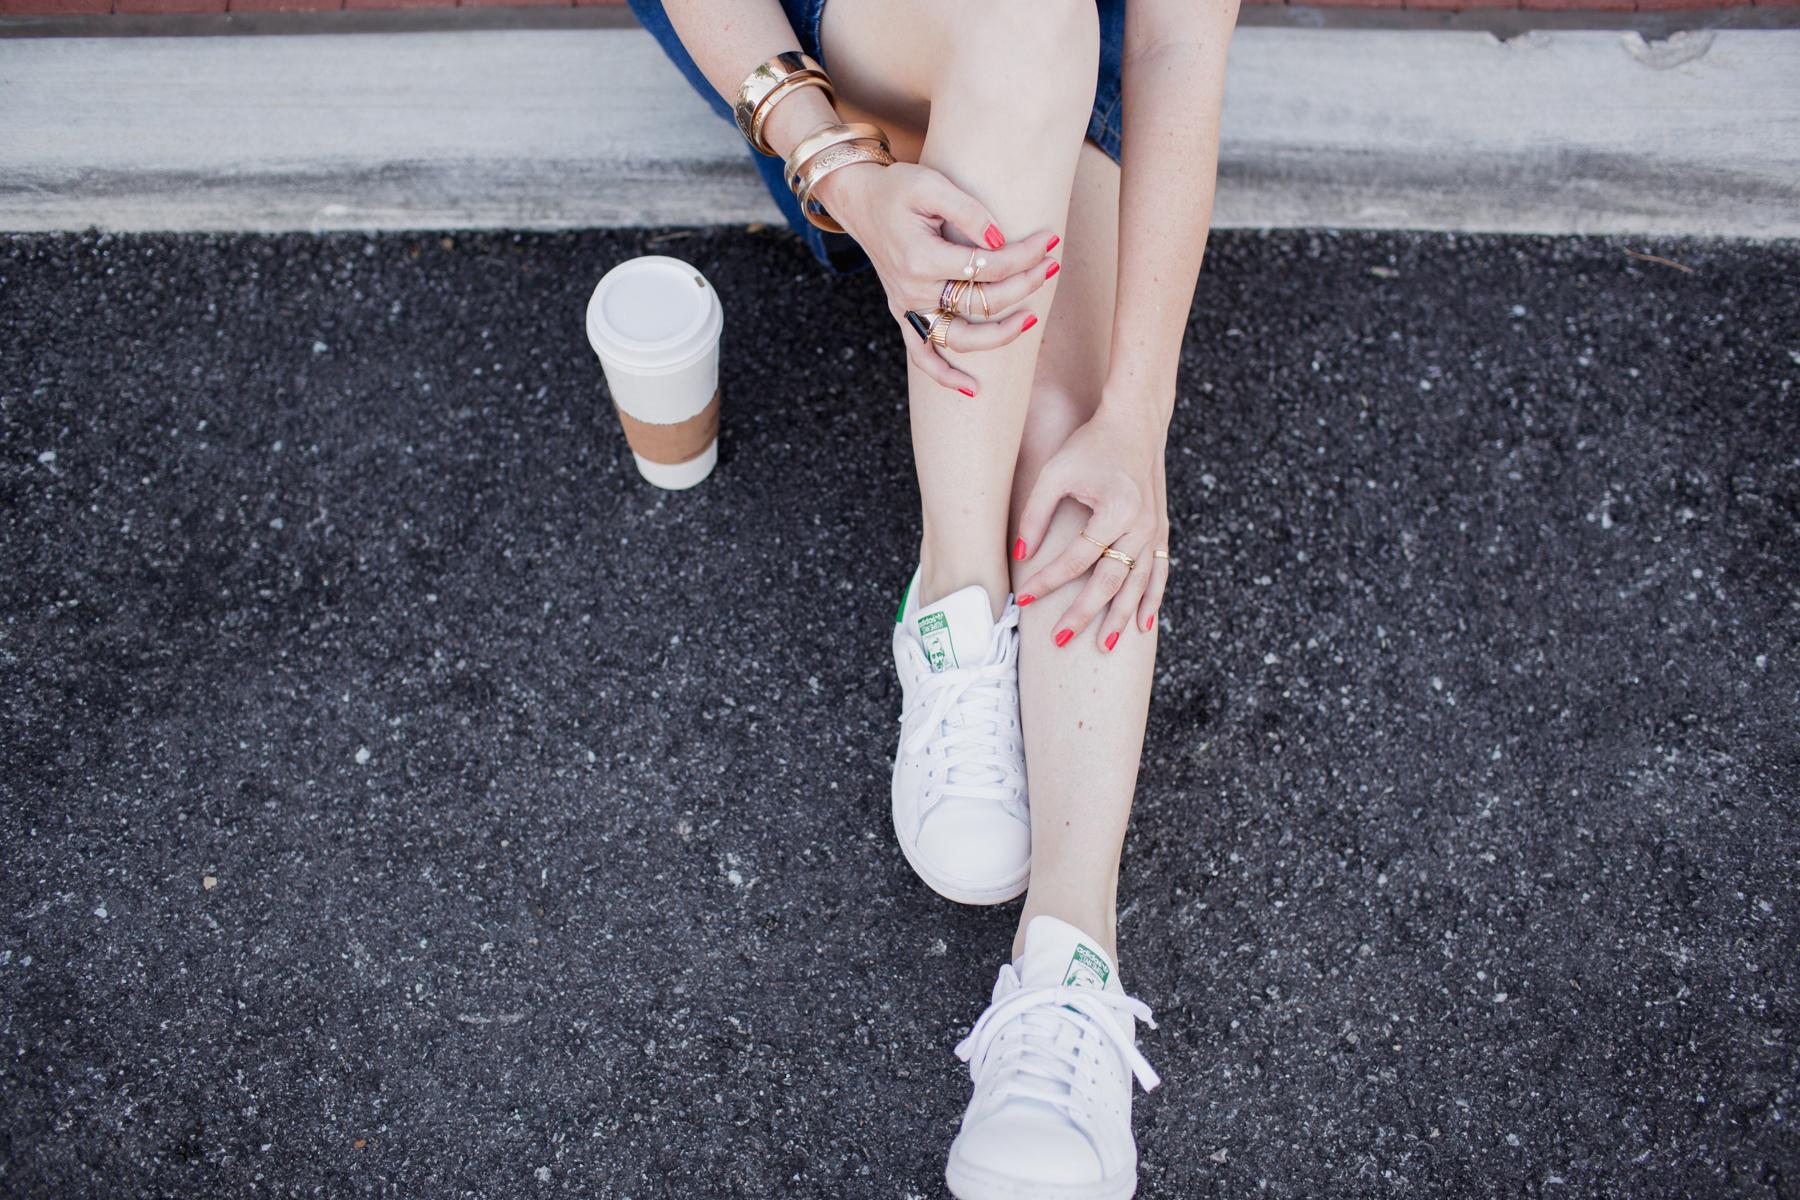 anna_e_cottrell_eldridge_edit_fashion_blogger_mgb_photo_denim_dress_summer_2016_trends_adidas_stan_smith_vintage_jewelry_acne_aviator_sunglasses_coffee_2.jpg